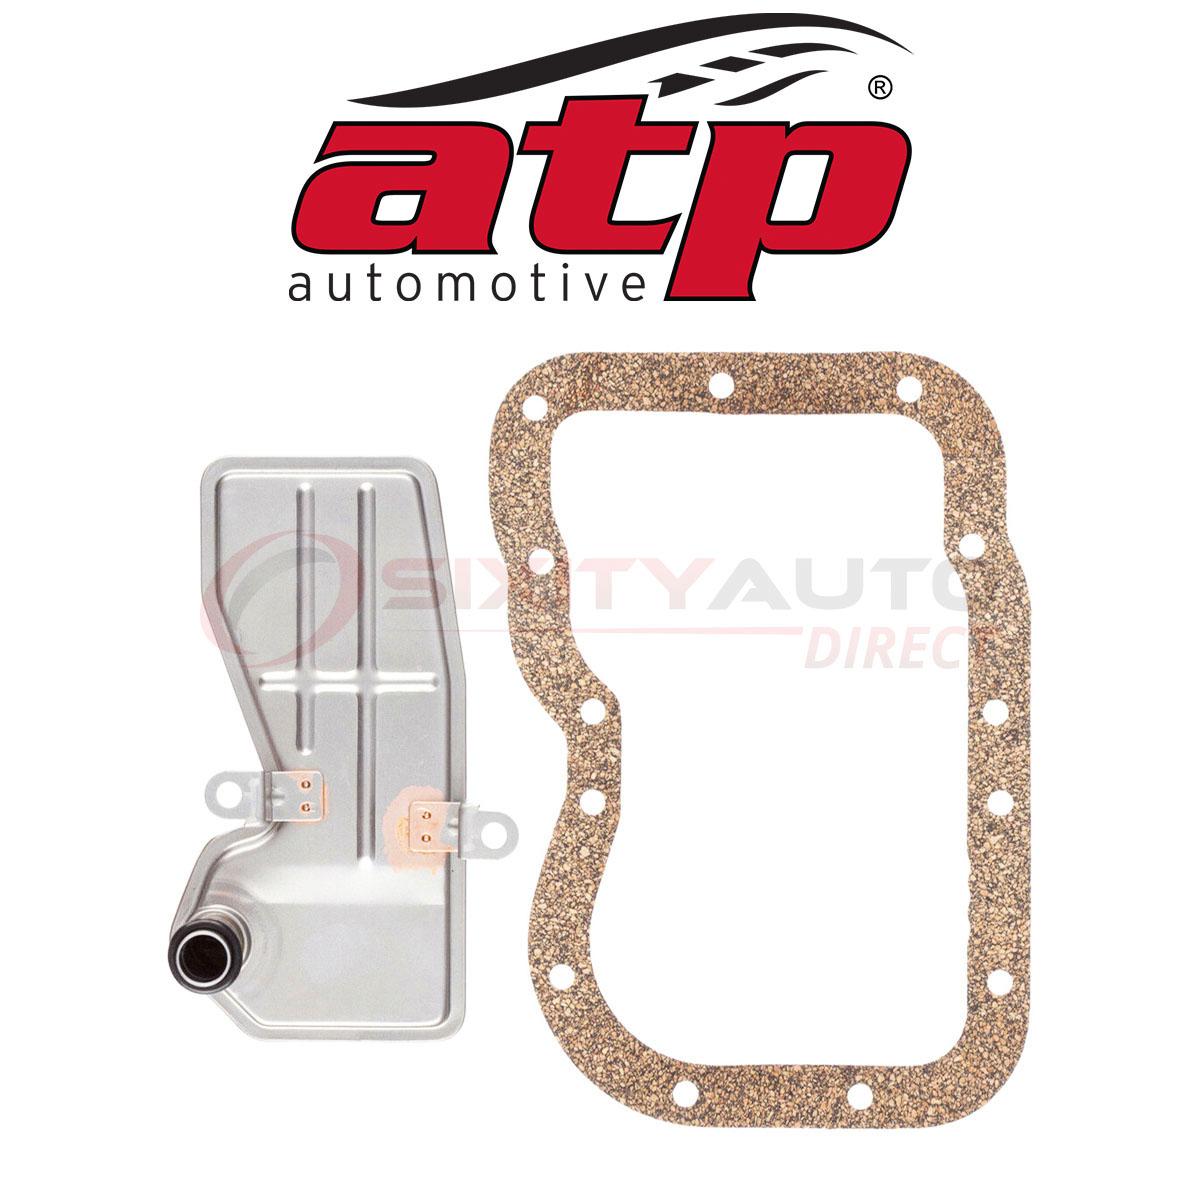 ATP Automotive Auto Transmission Filter Kit for 2011-2016 Toyota Sienna 3.5L qk